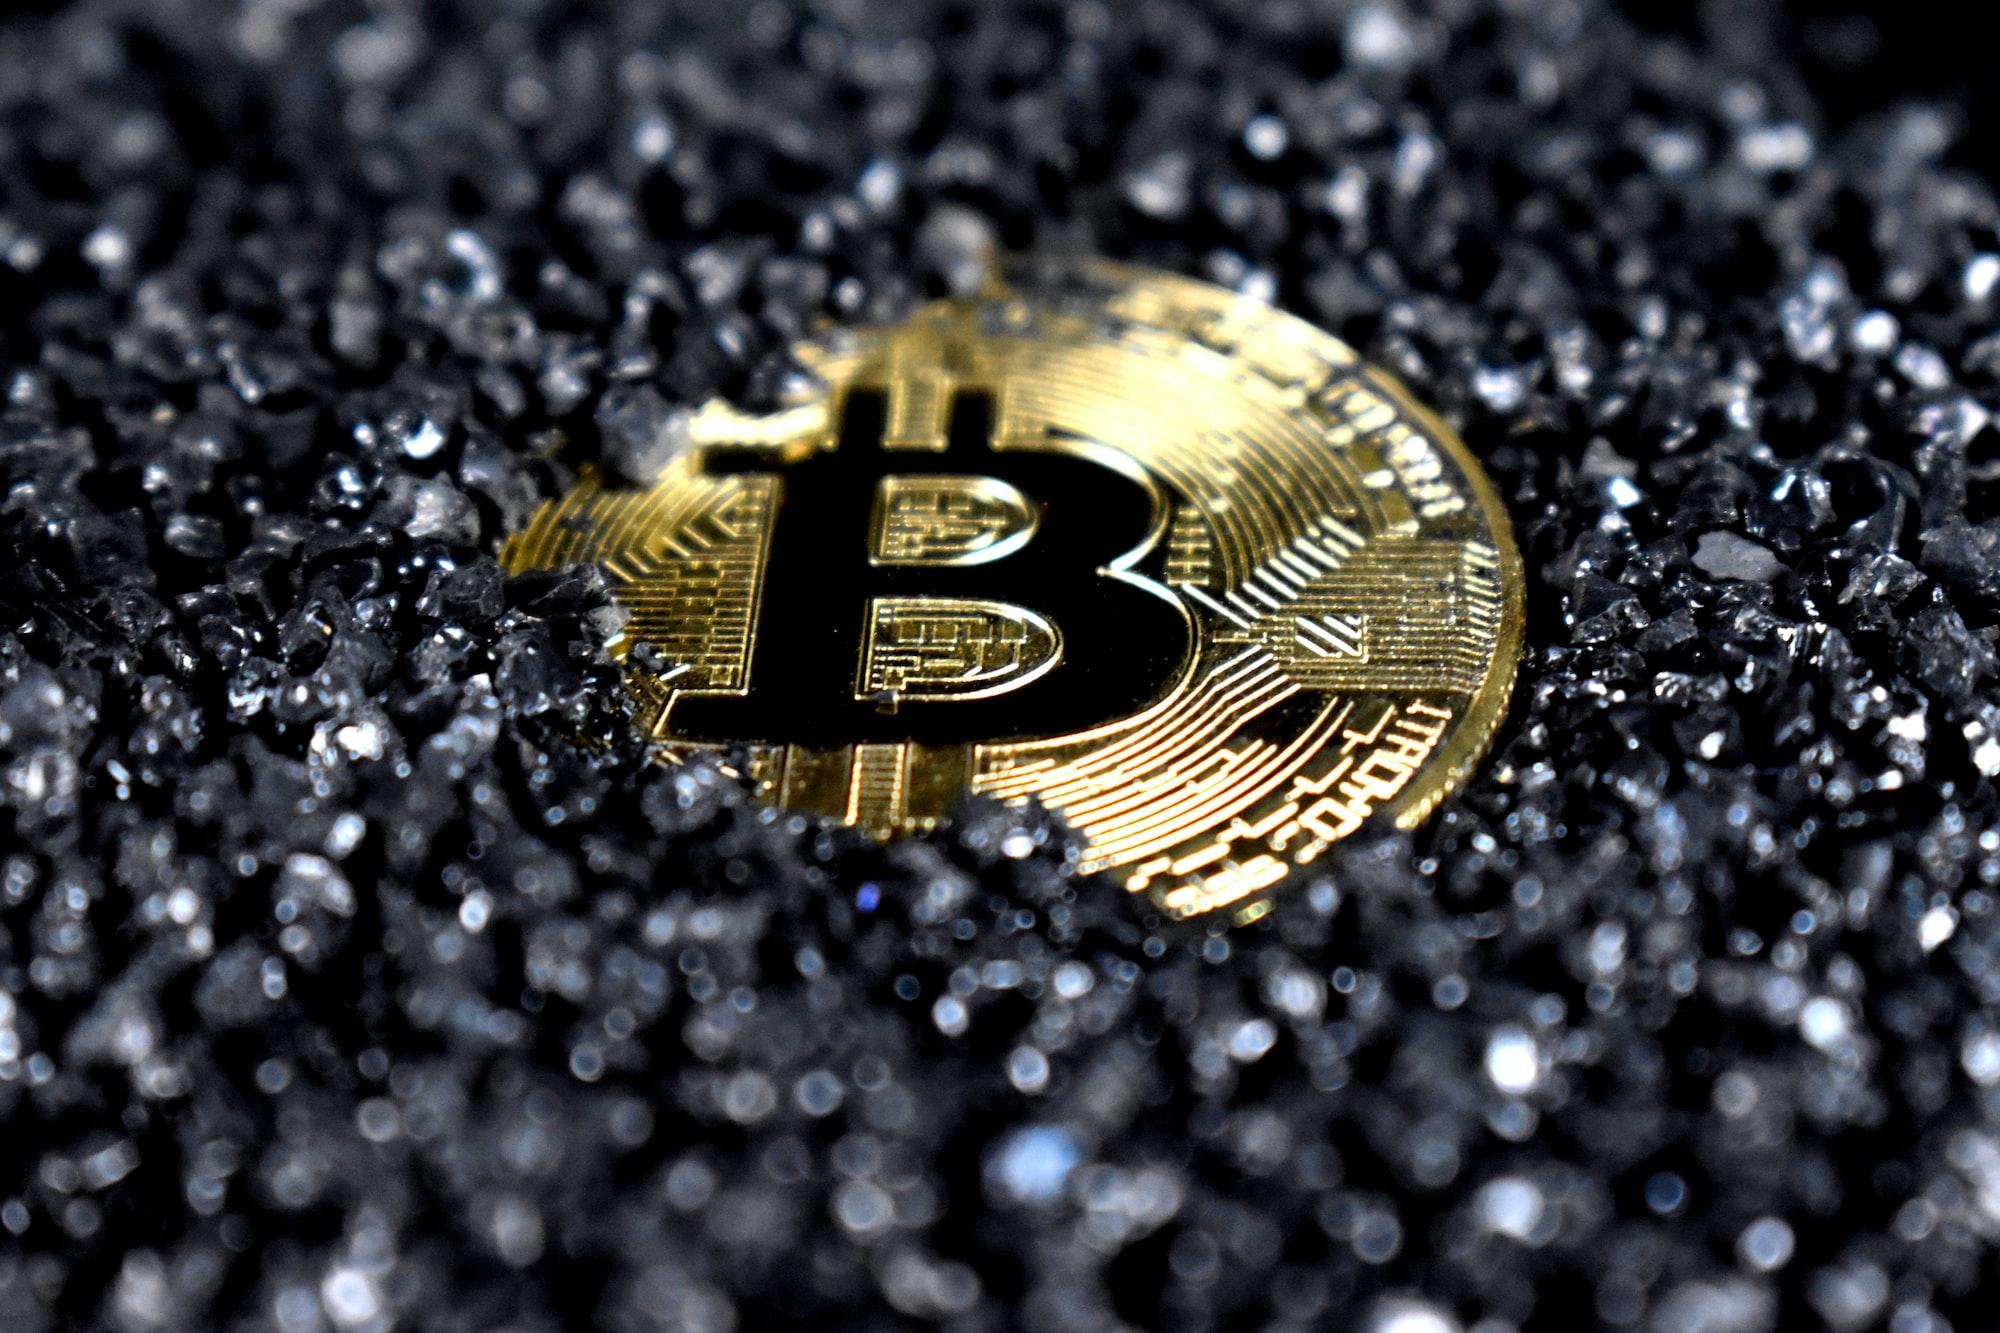 Tweetstorm -Satoshi Nakamoto revolutionized one industry, now Bitcoin is taking on another - a thread